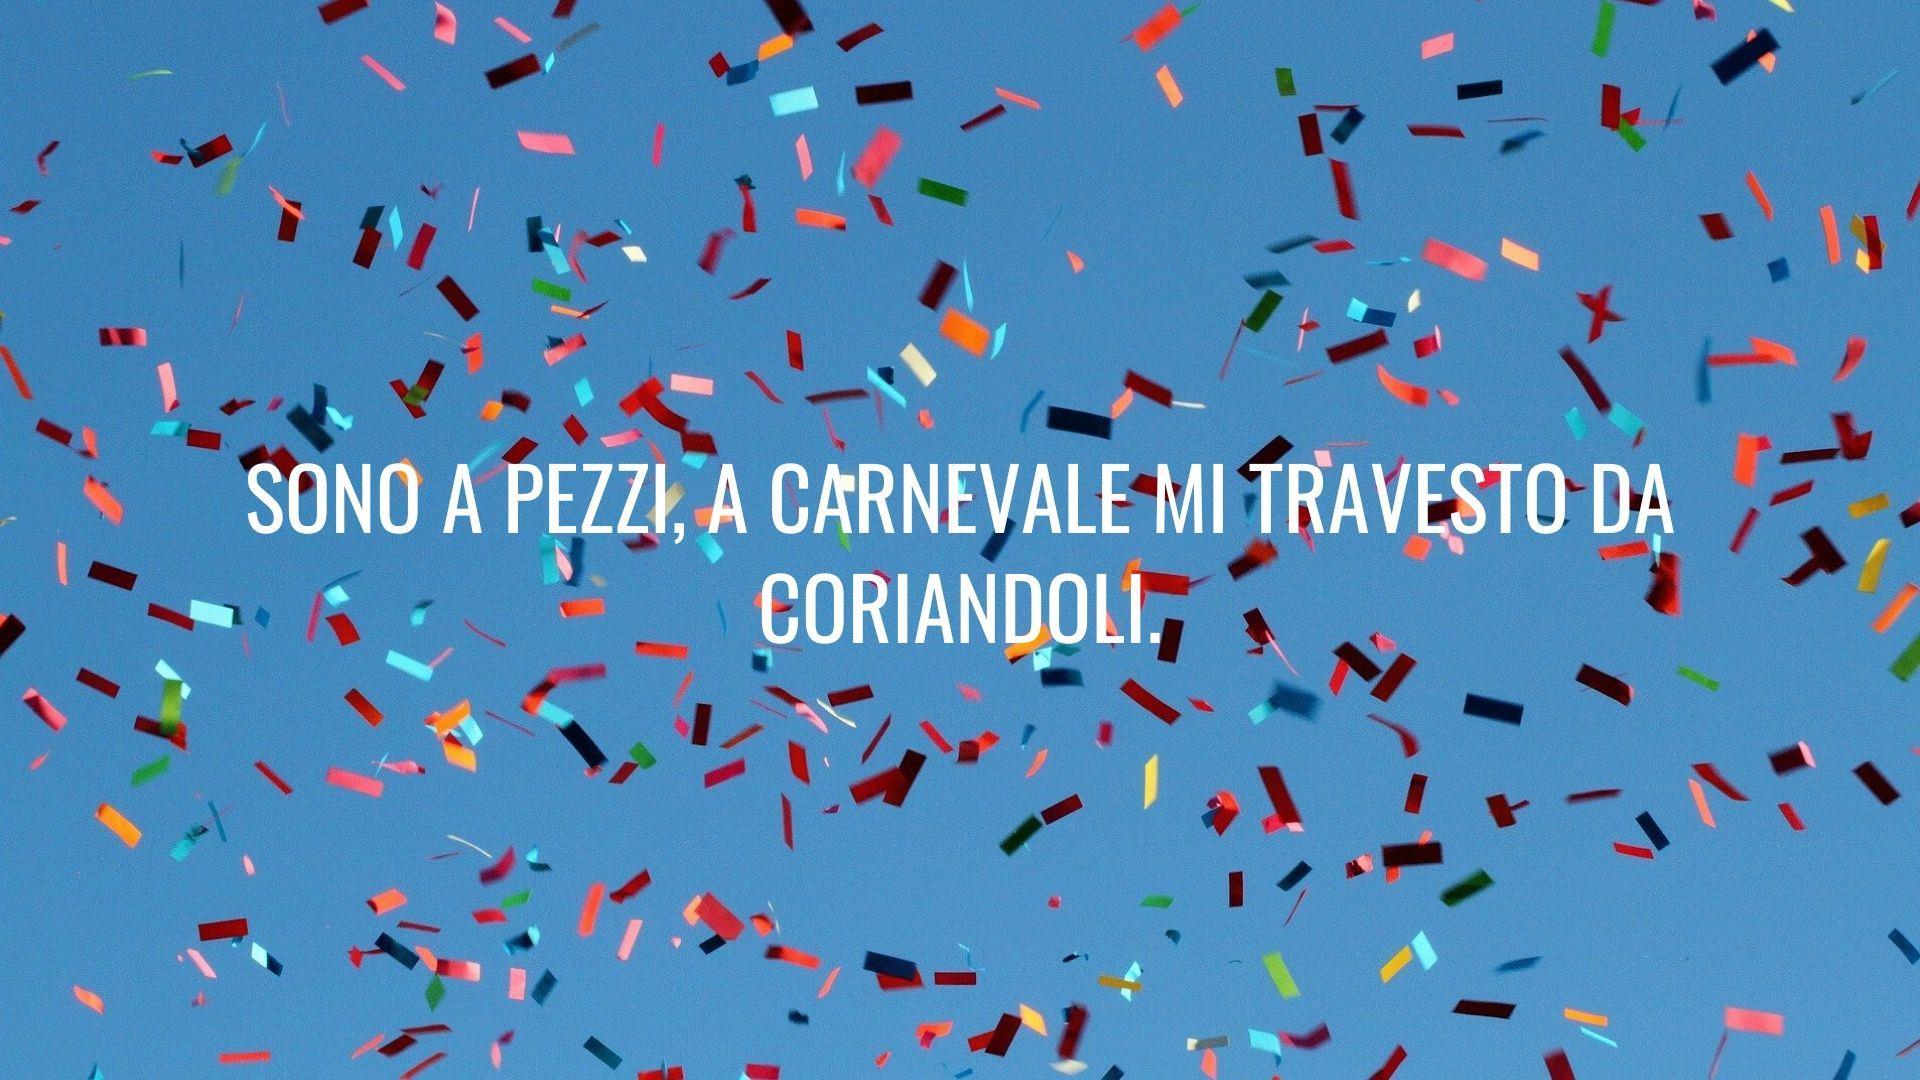 50 Frasi Citazioni E Aforismi Sul Carnevale